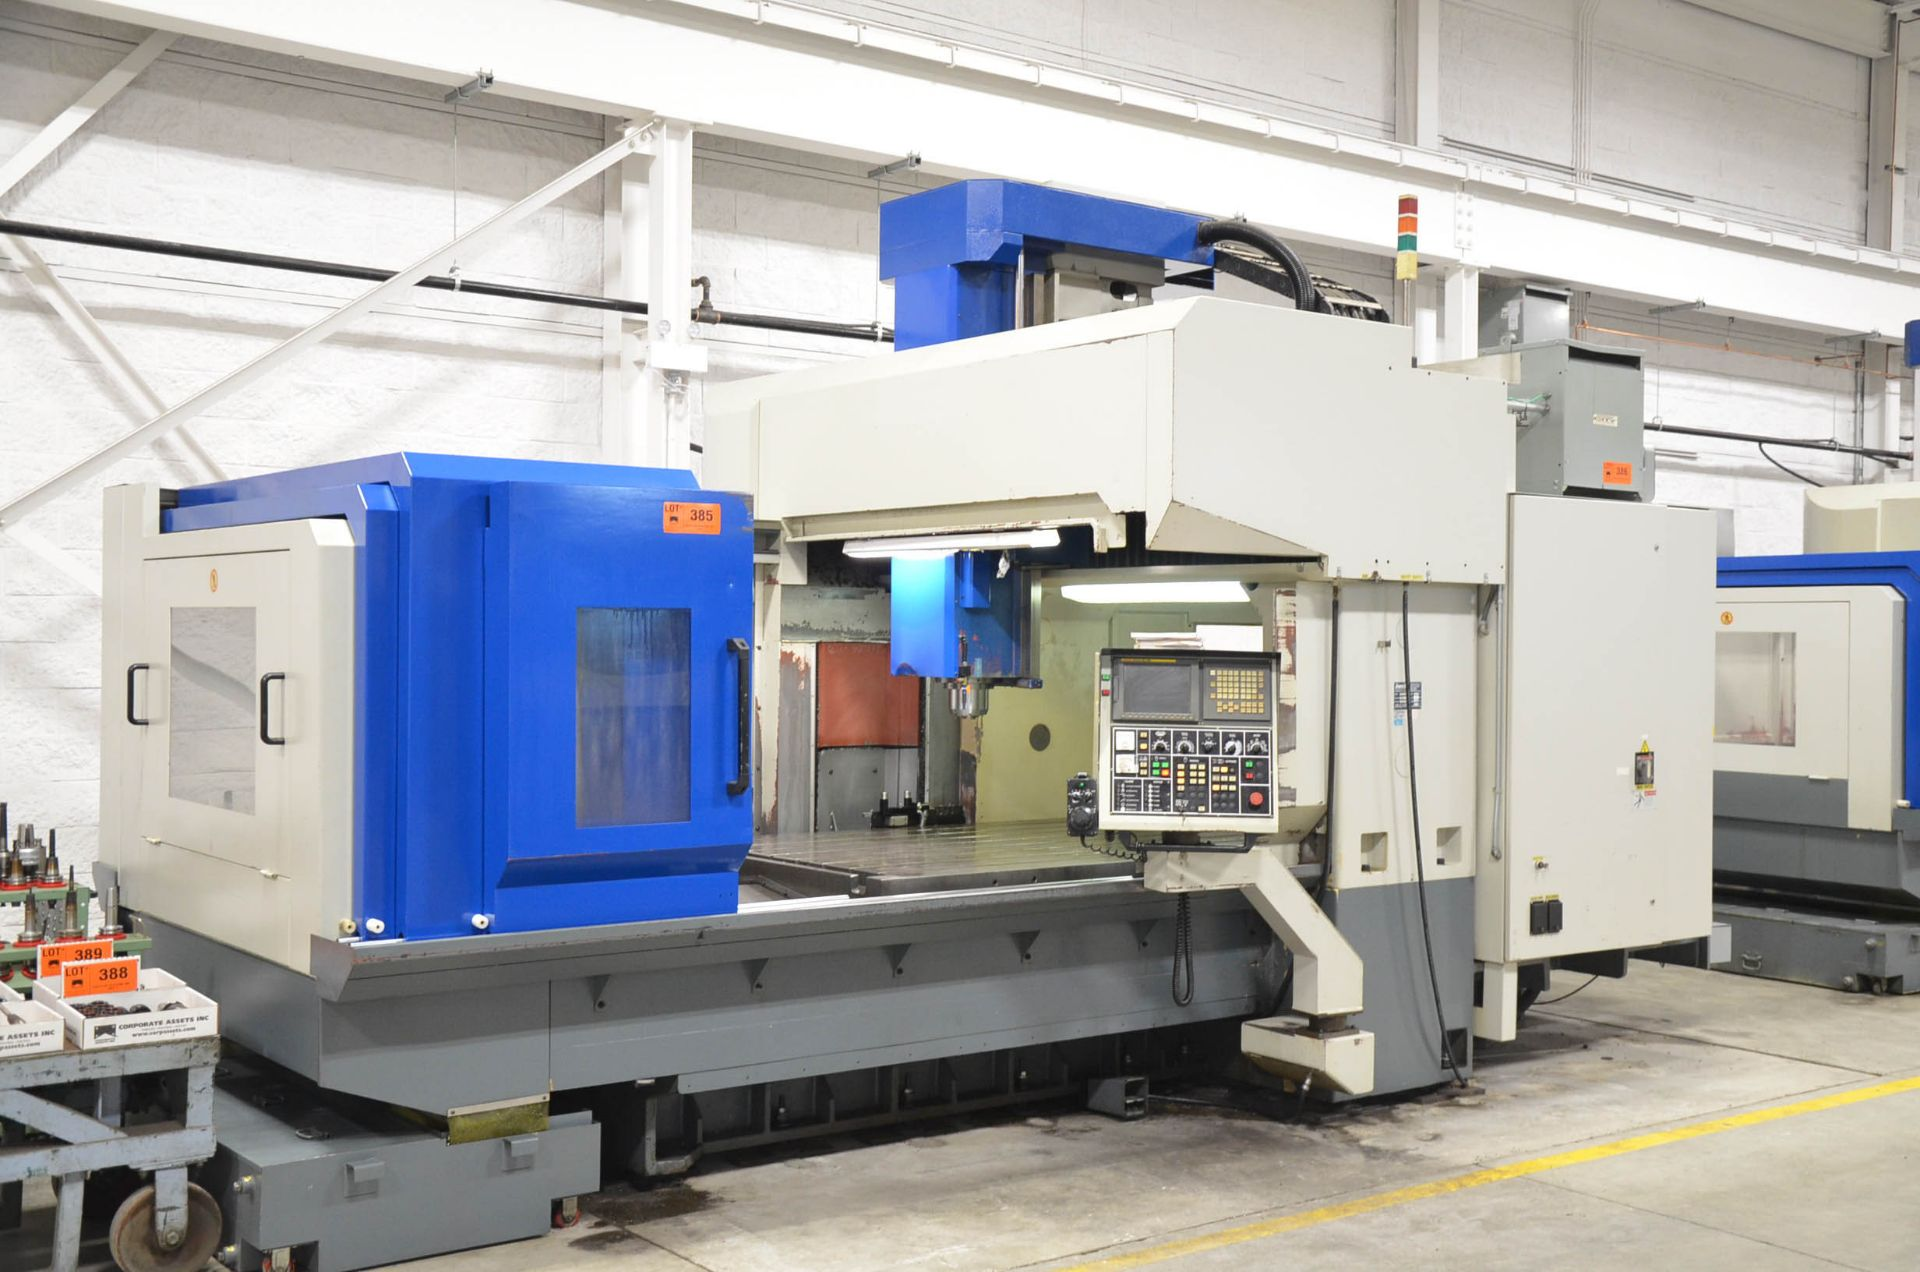 AWEA (2005) SP2016HSS GANTRY-TYPE CNC VERTICAL MACHINING CENTER WITH FANUC SERIES 18I-MB CNC